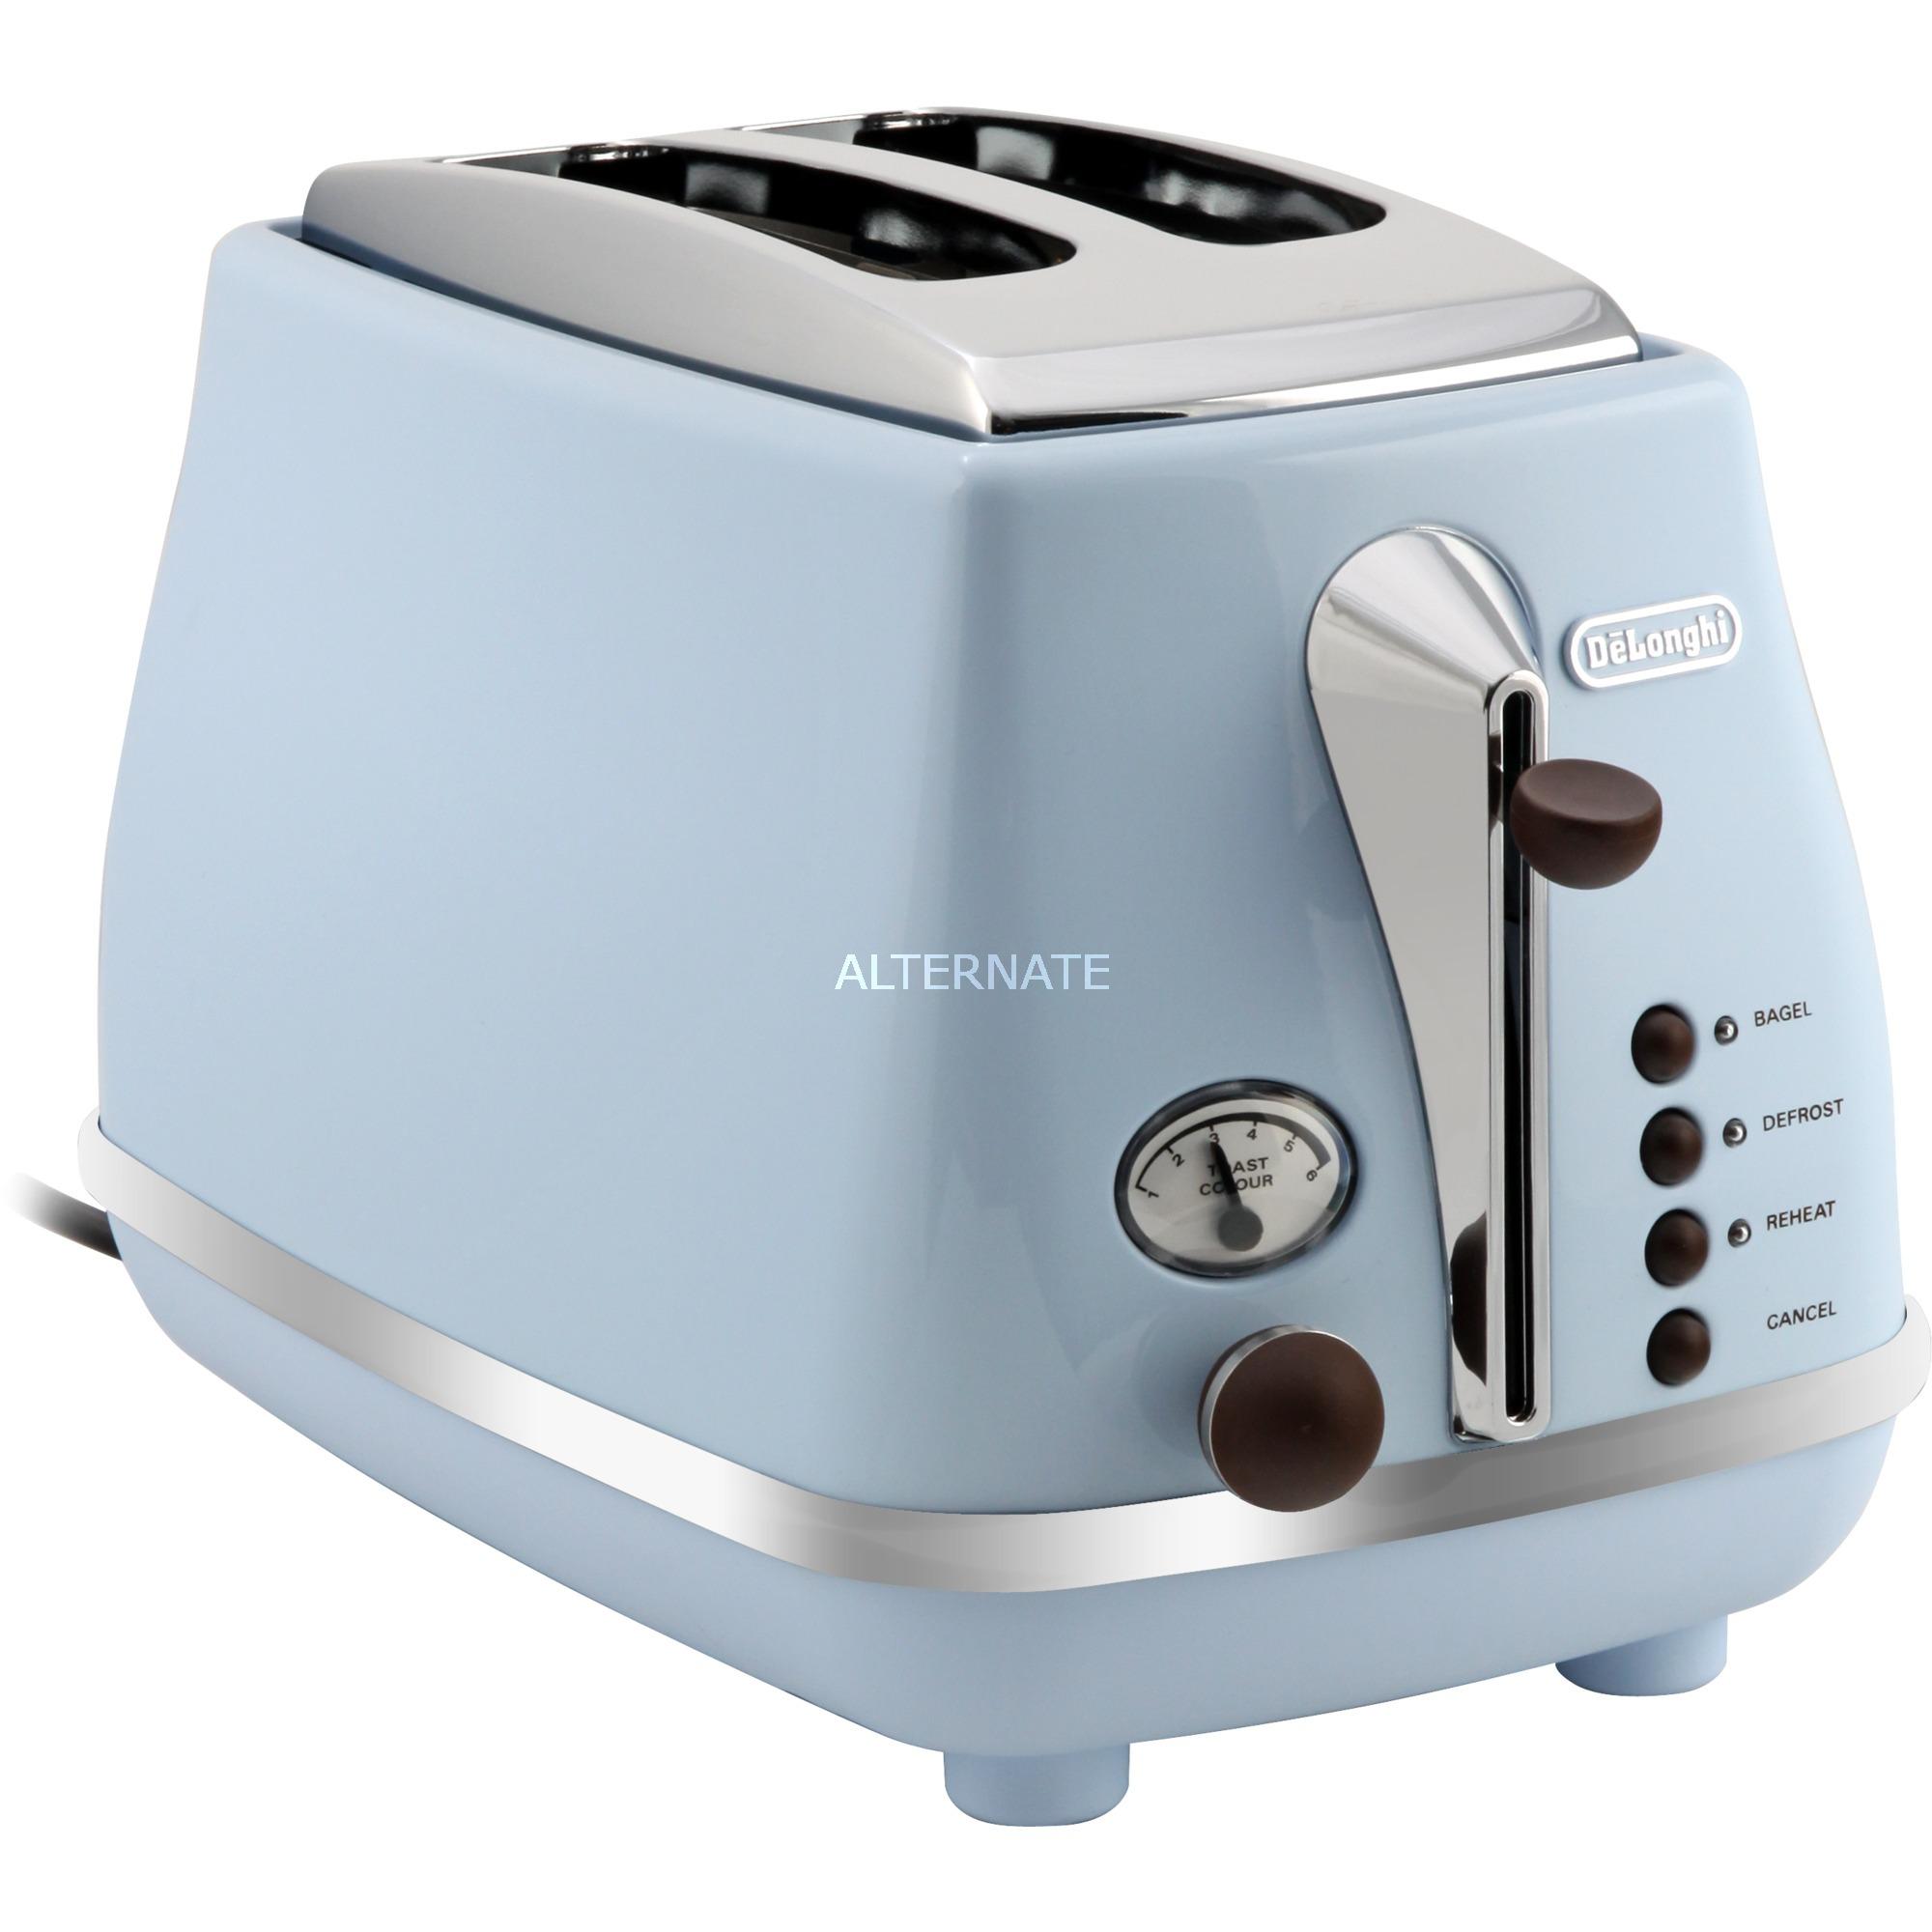 CTOV 2103.AZ 2slice(s) 900W Azul tostadora